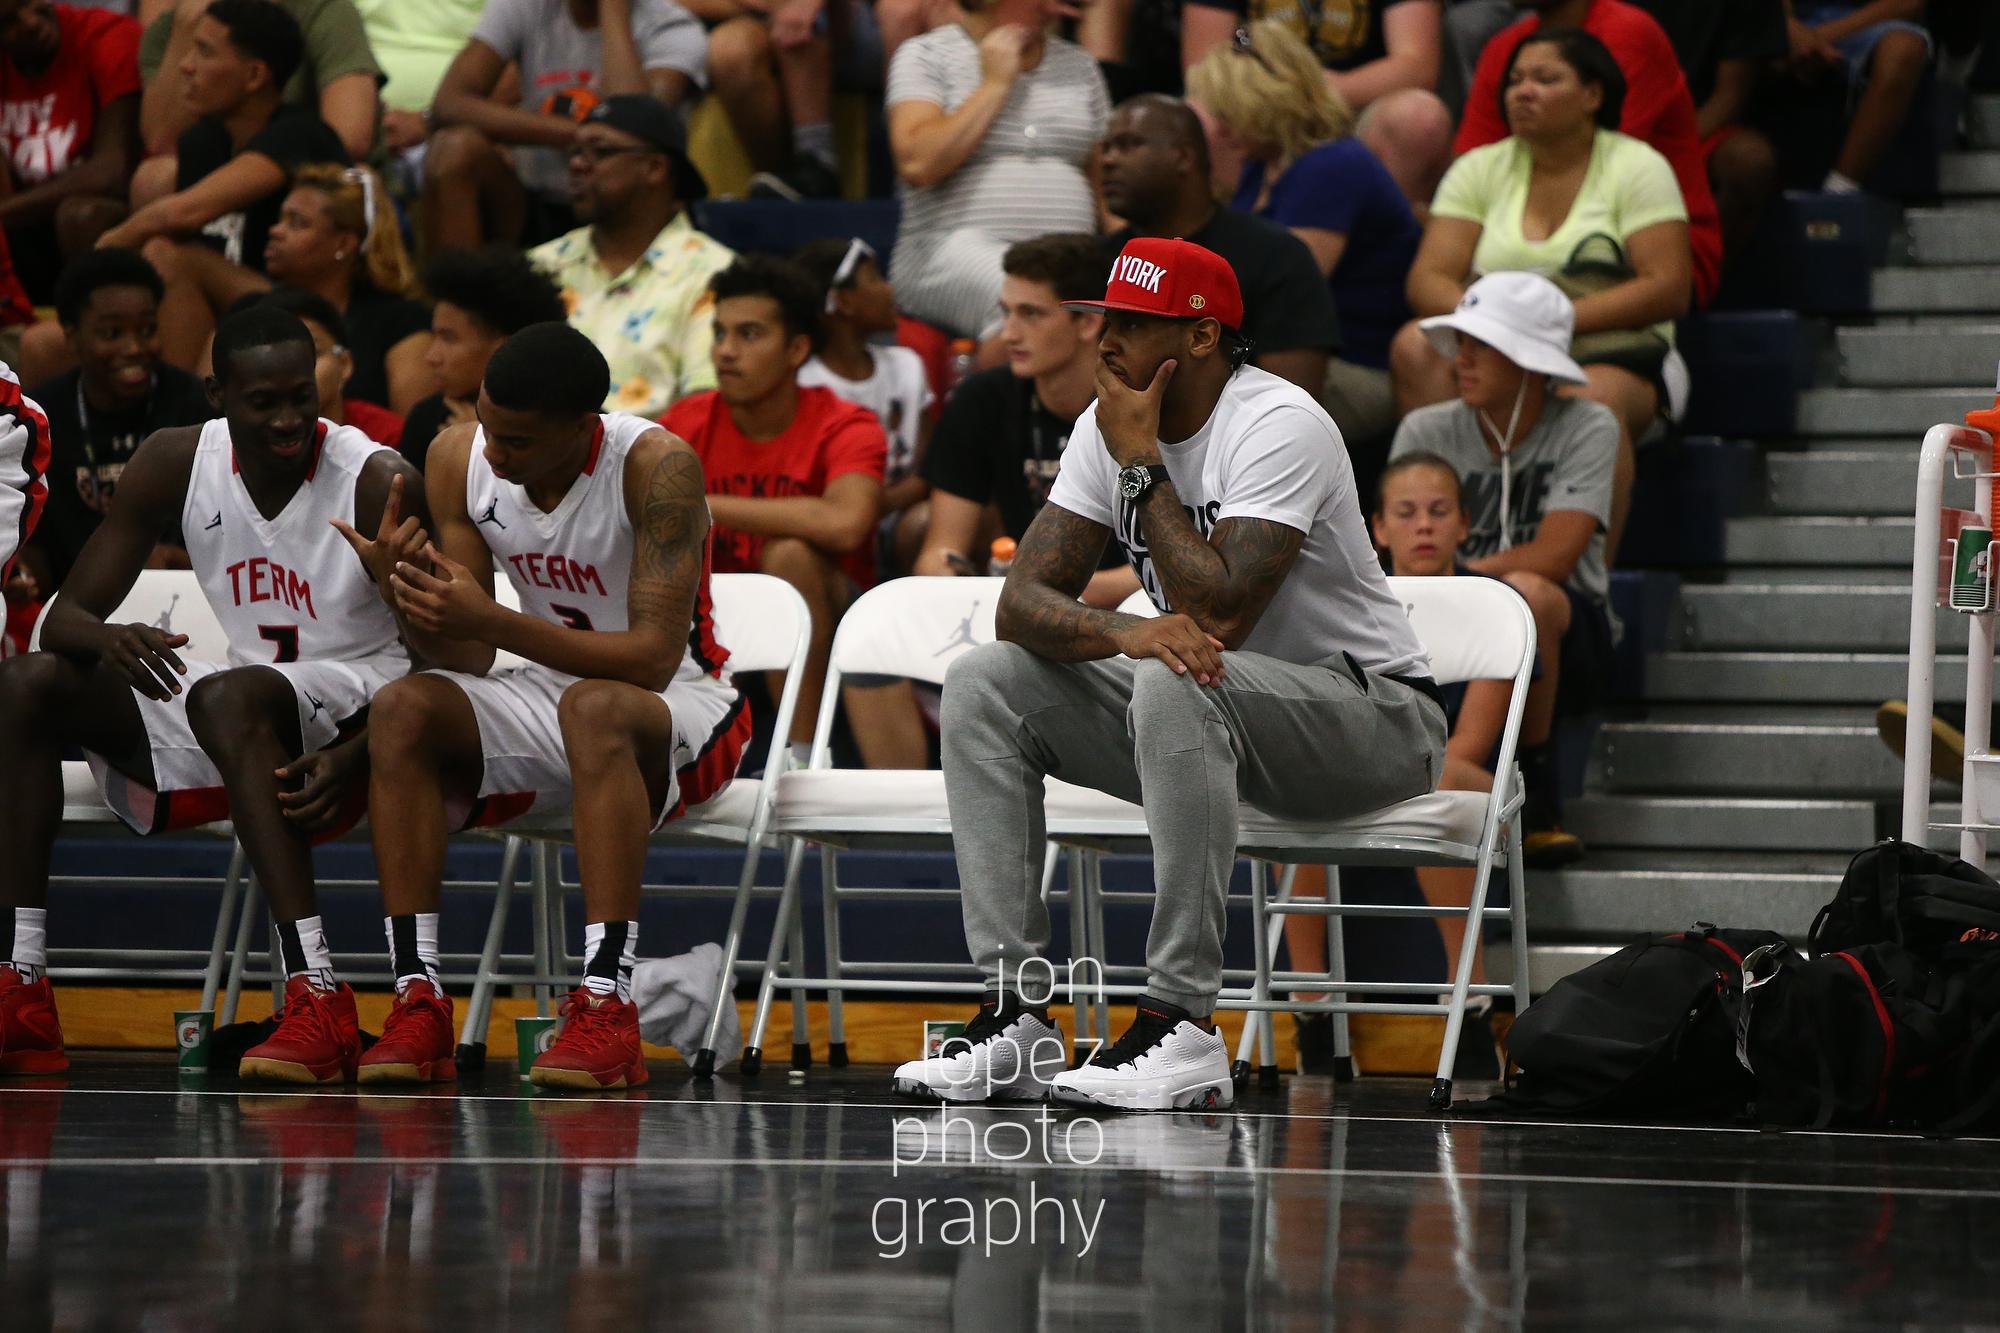 LAS VEGAS, NV. JULY 20, 2016. The Eight. Carmelo Anthony sits on Team Melo bench. (Mandatory photo credit: Jon Lopez/Nike).